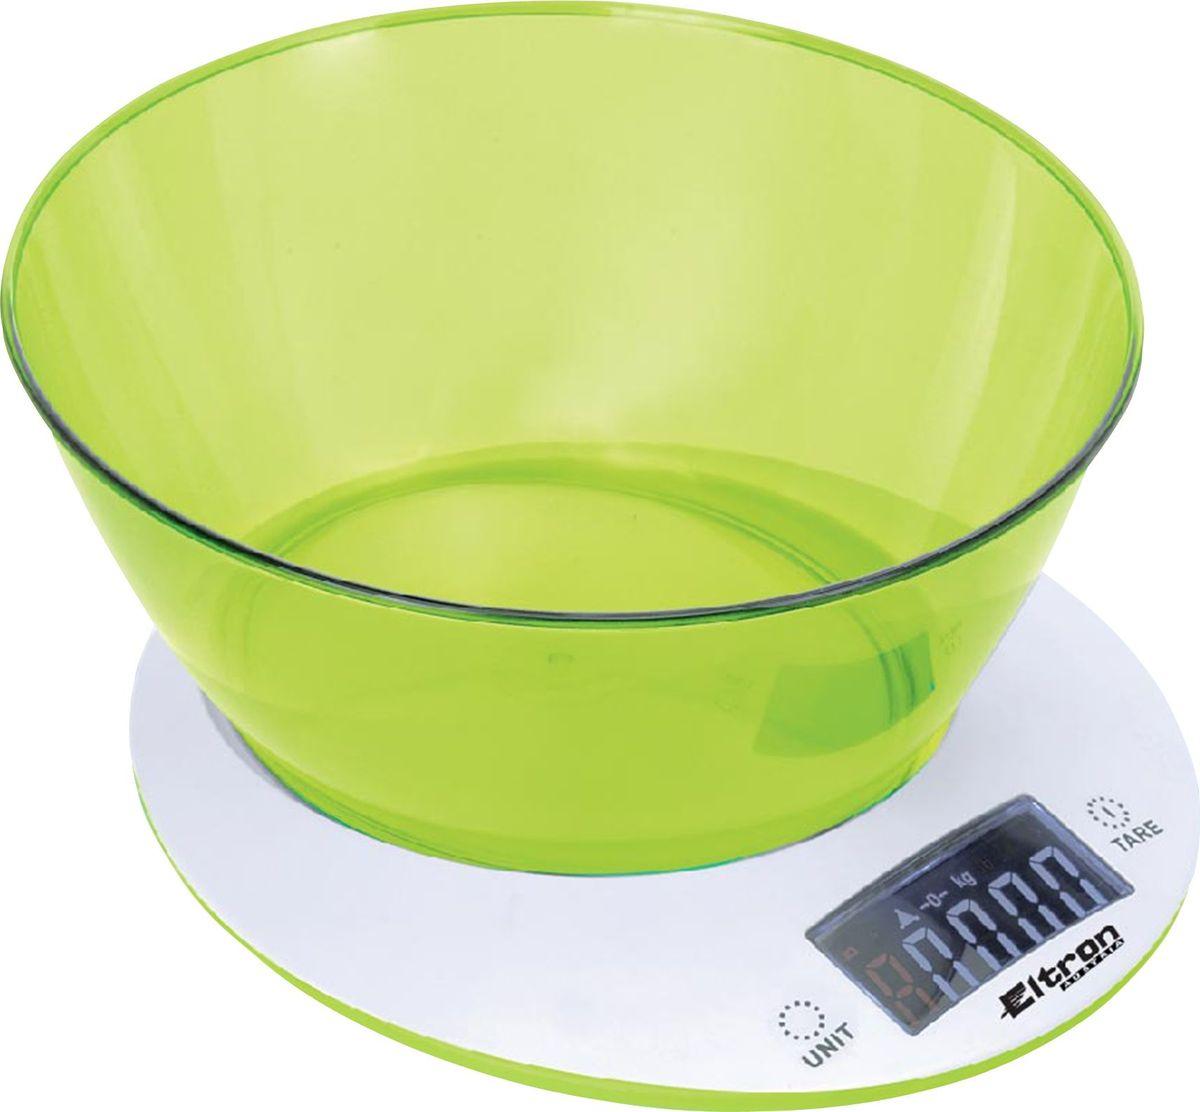 Весы кухонные  Eltron , электронные, цвет: белый, до 5 кг. 9264EL - Кухонные весы